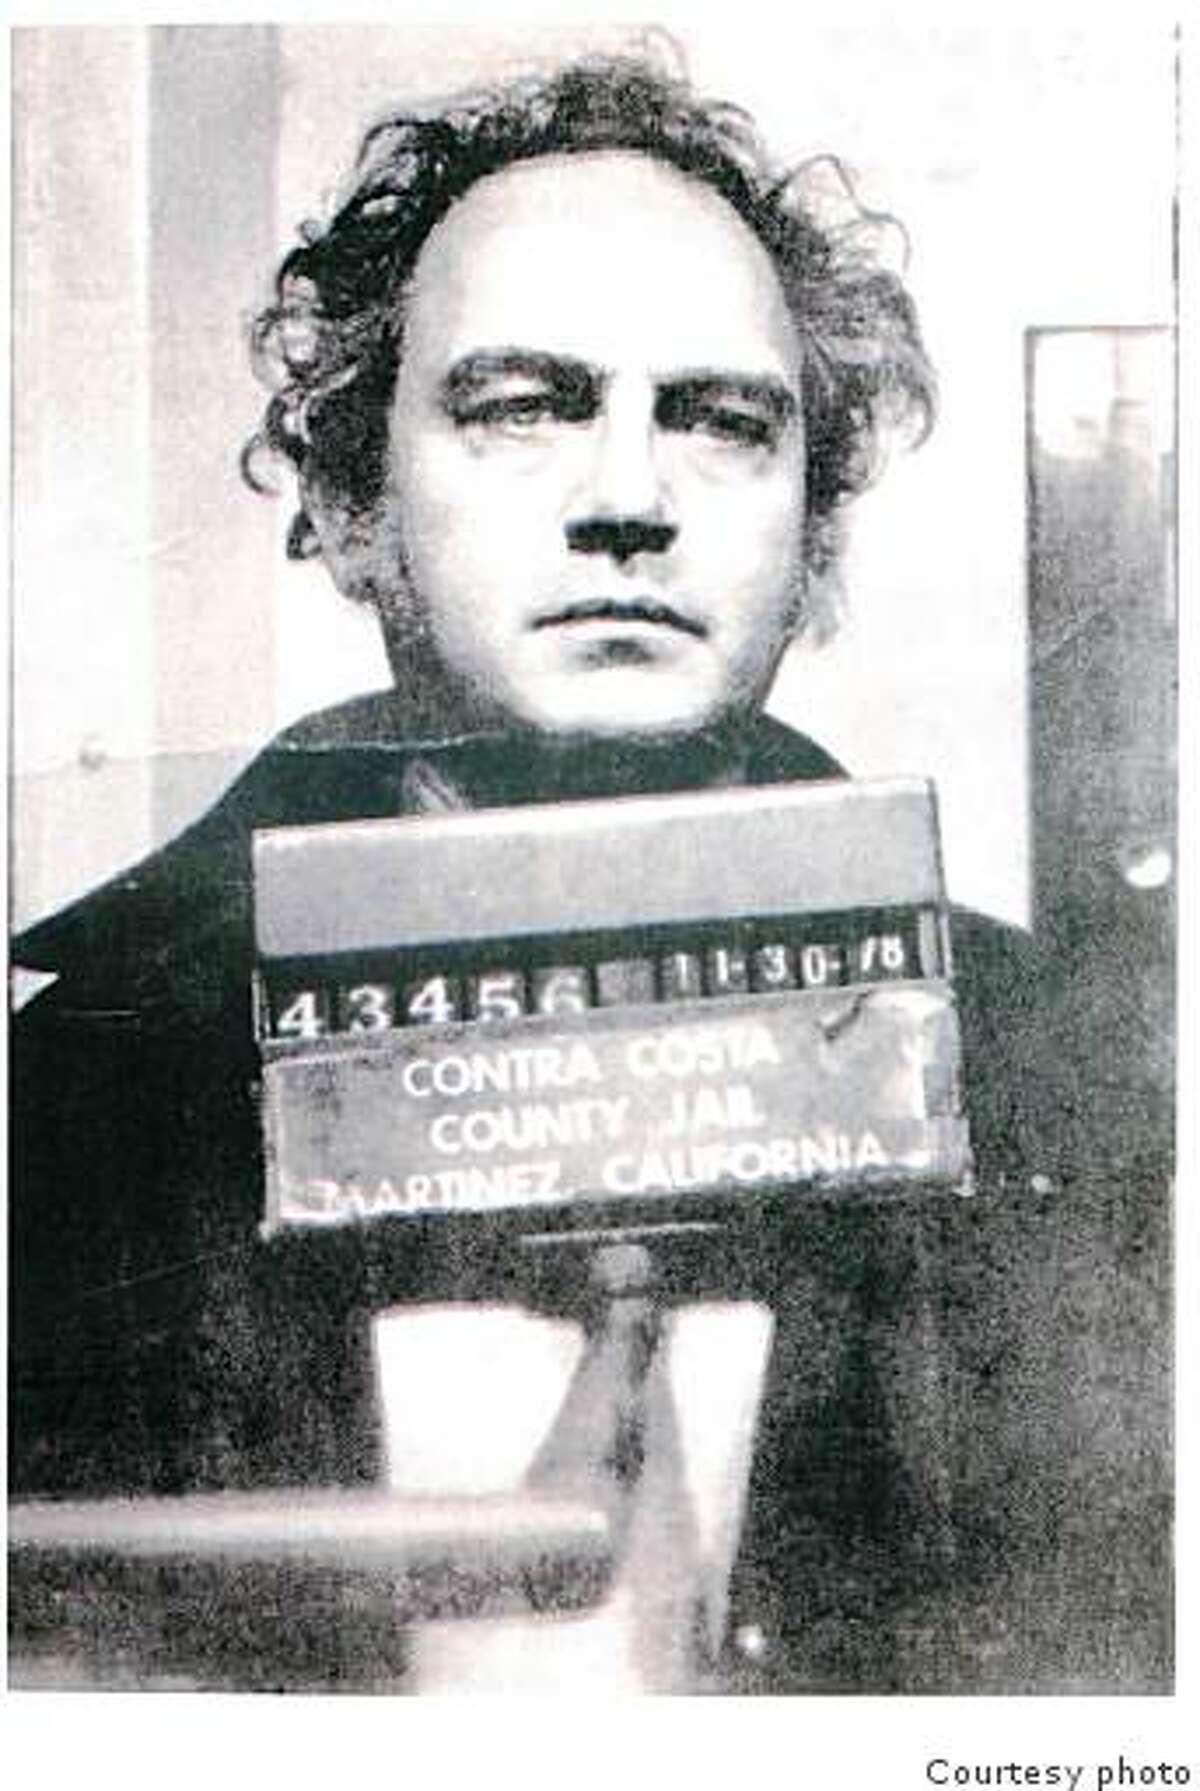 Darryl Kemp, now 67, in Nov. 30 1978 booking photo when he was arrested for prowling in Walnut Creek. (ran in 2003)